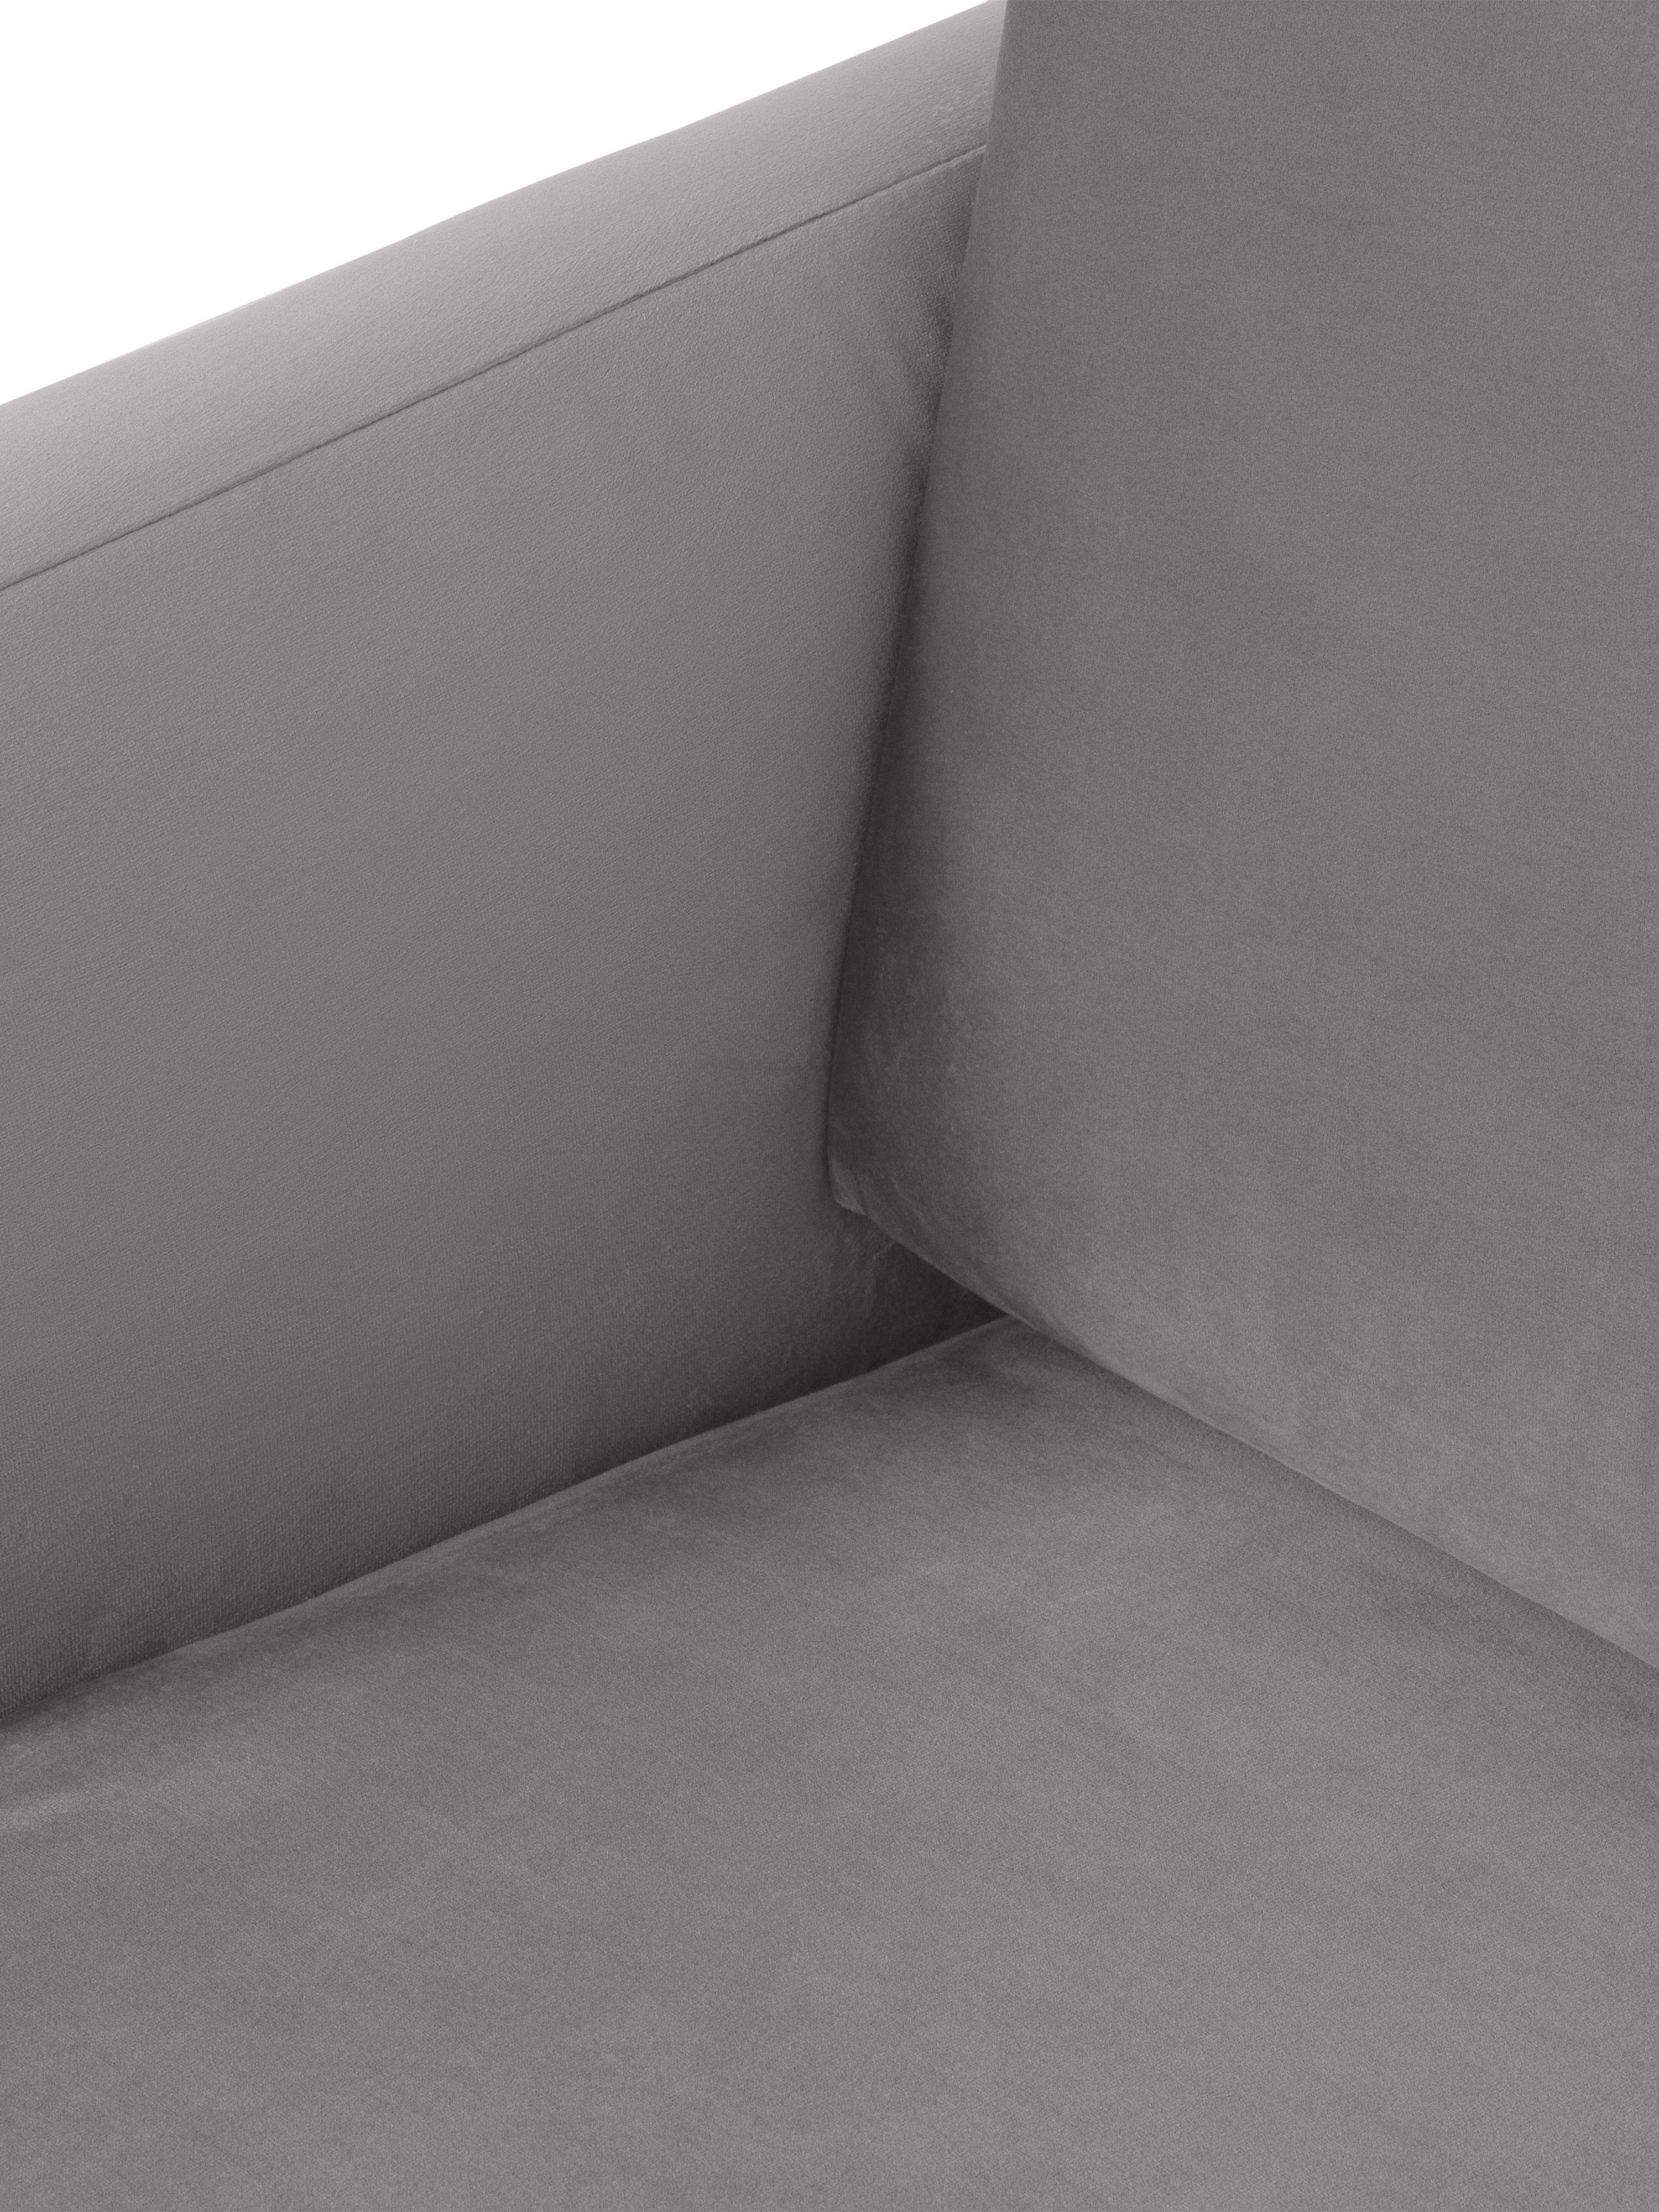 Samt-Ecksofa Fluente, Bezug: Samt (Hochwertiger Polyes, Gestell: Massives Kiefernholz, Füße: Metall, pulverbeschichtet, Samt Hellgrau, B 221 x T 200 cm